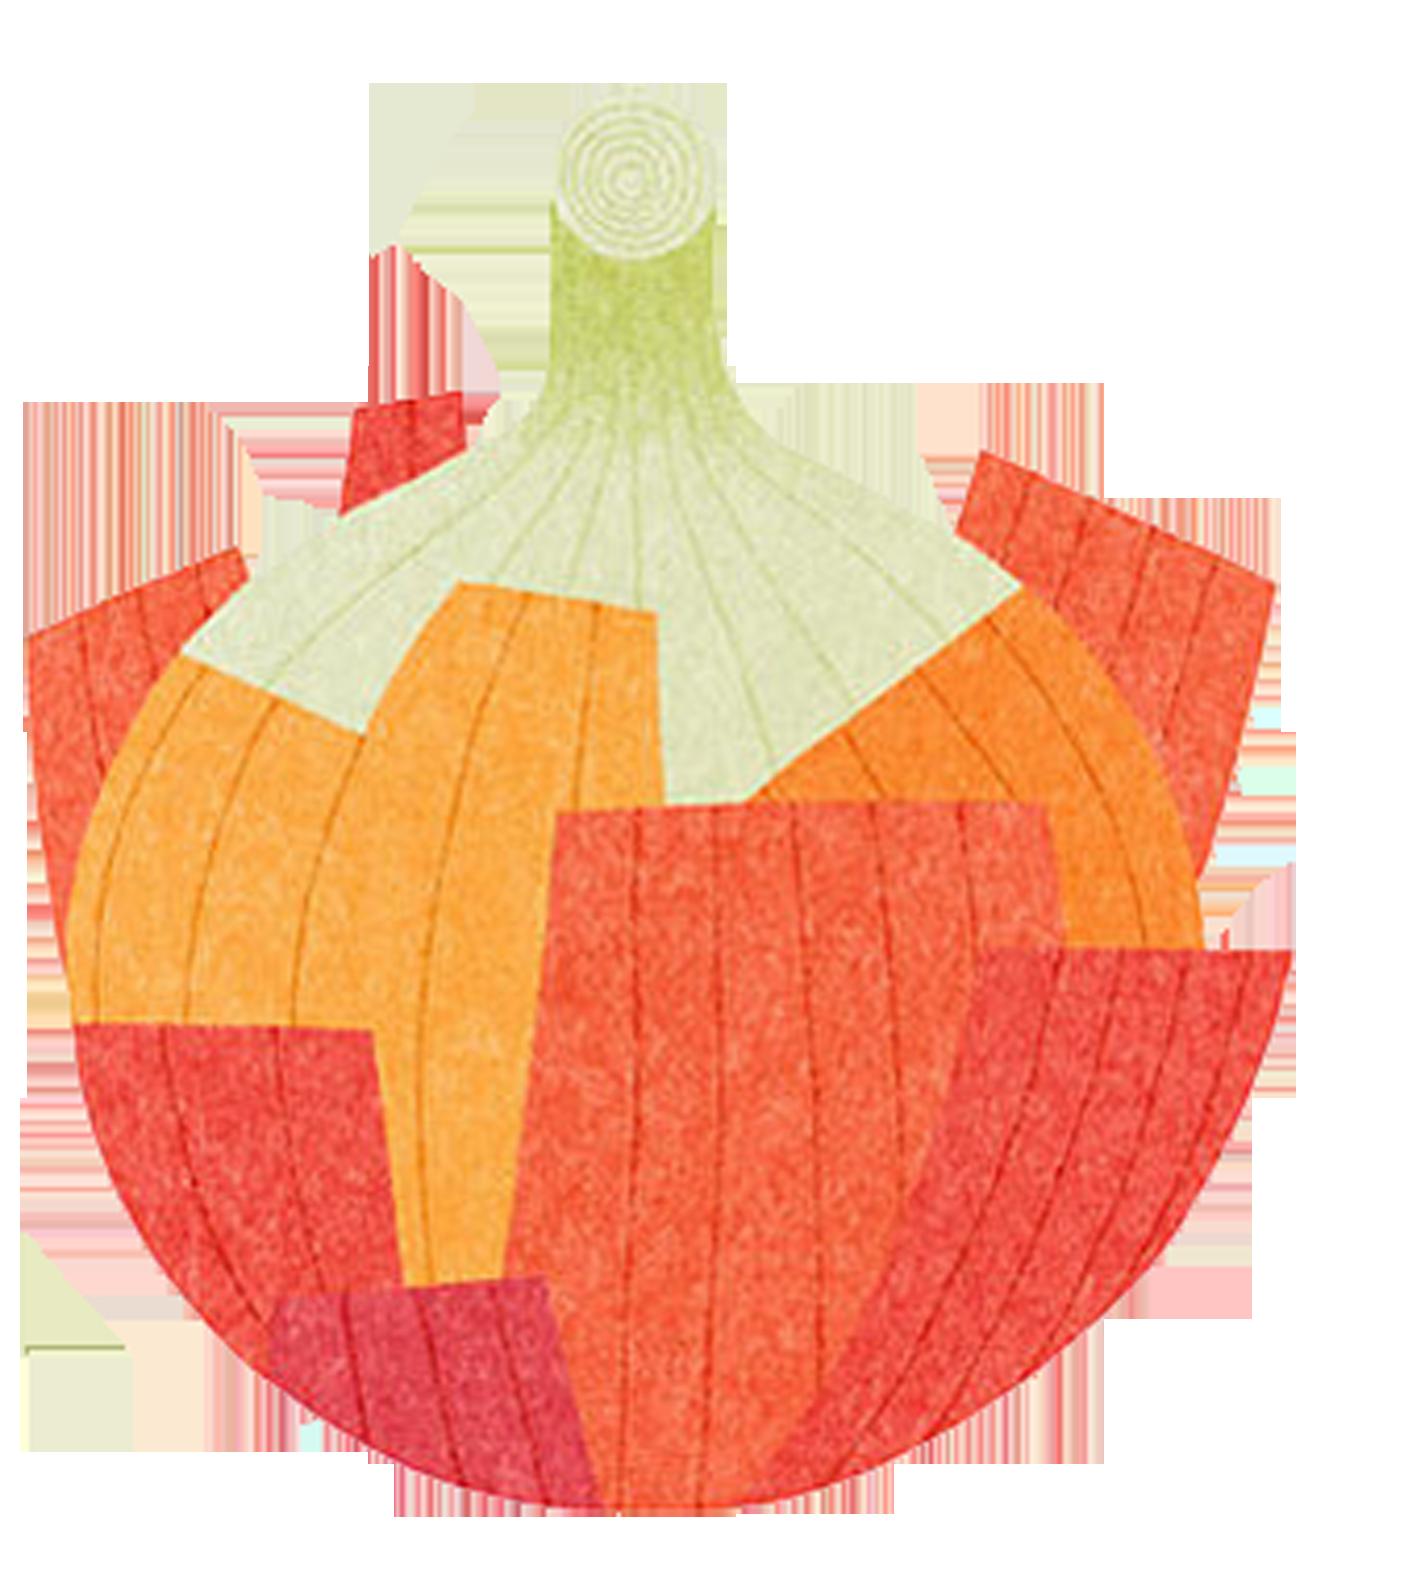 Garlic clipart illustration. Onion illustrator vegetable art